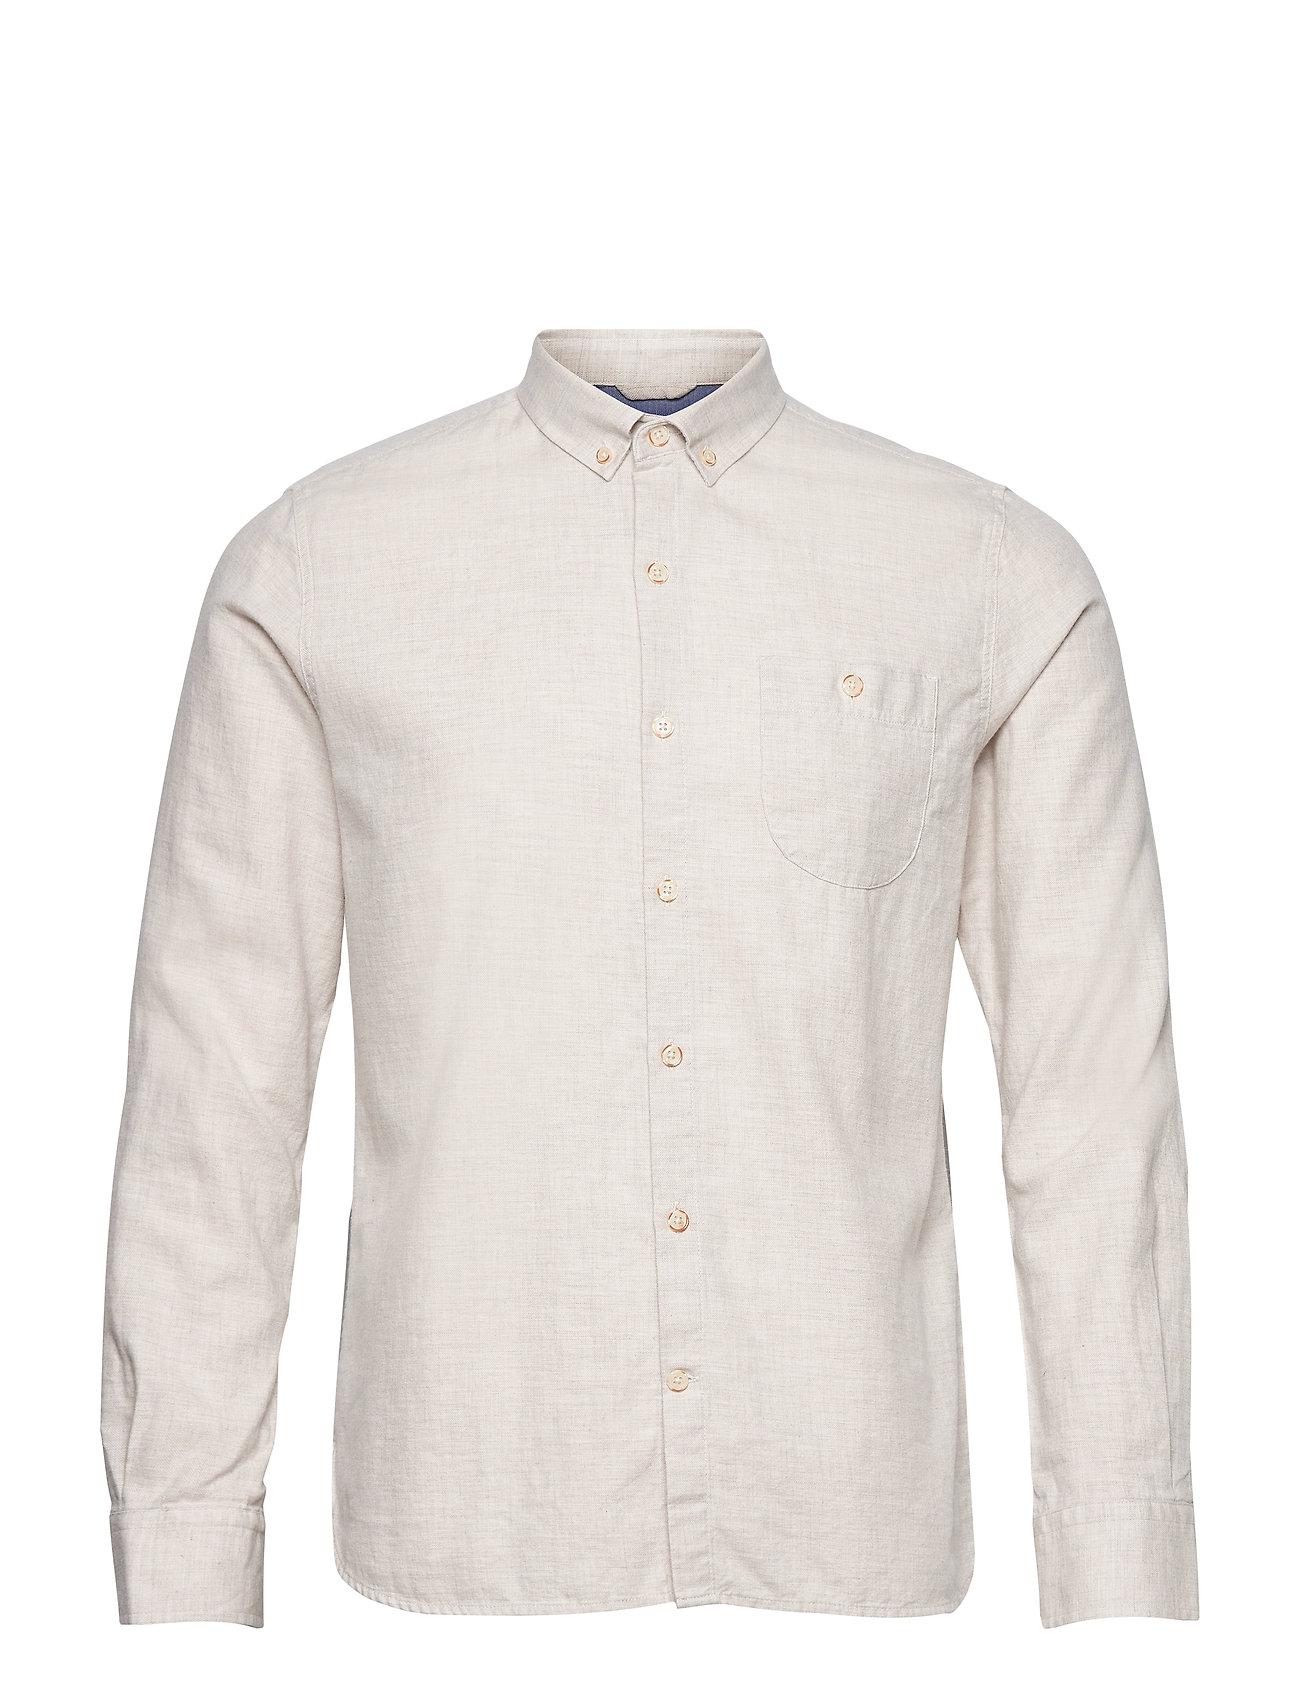 Knowledge Cotton Apparel Melange Effect Flannel Shirt - GOTS - GREIGE